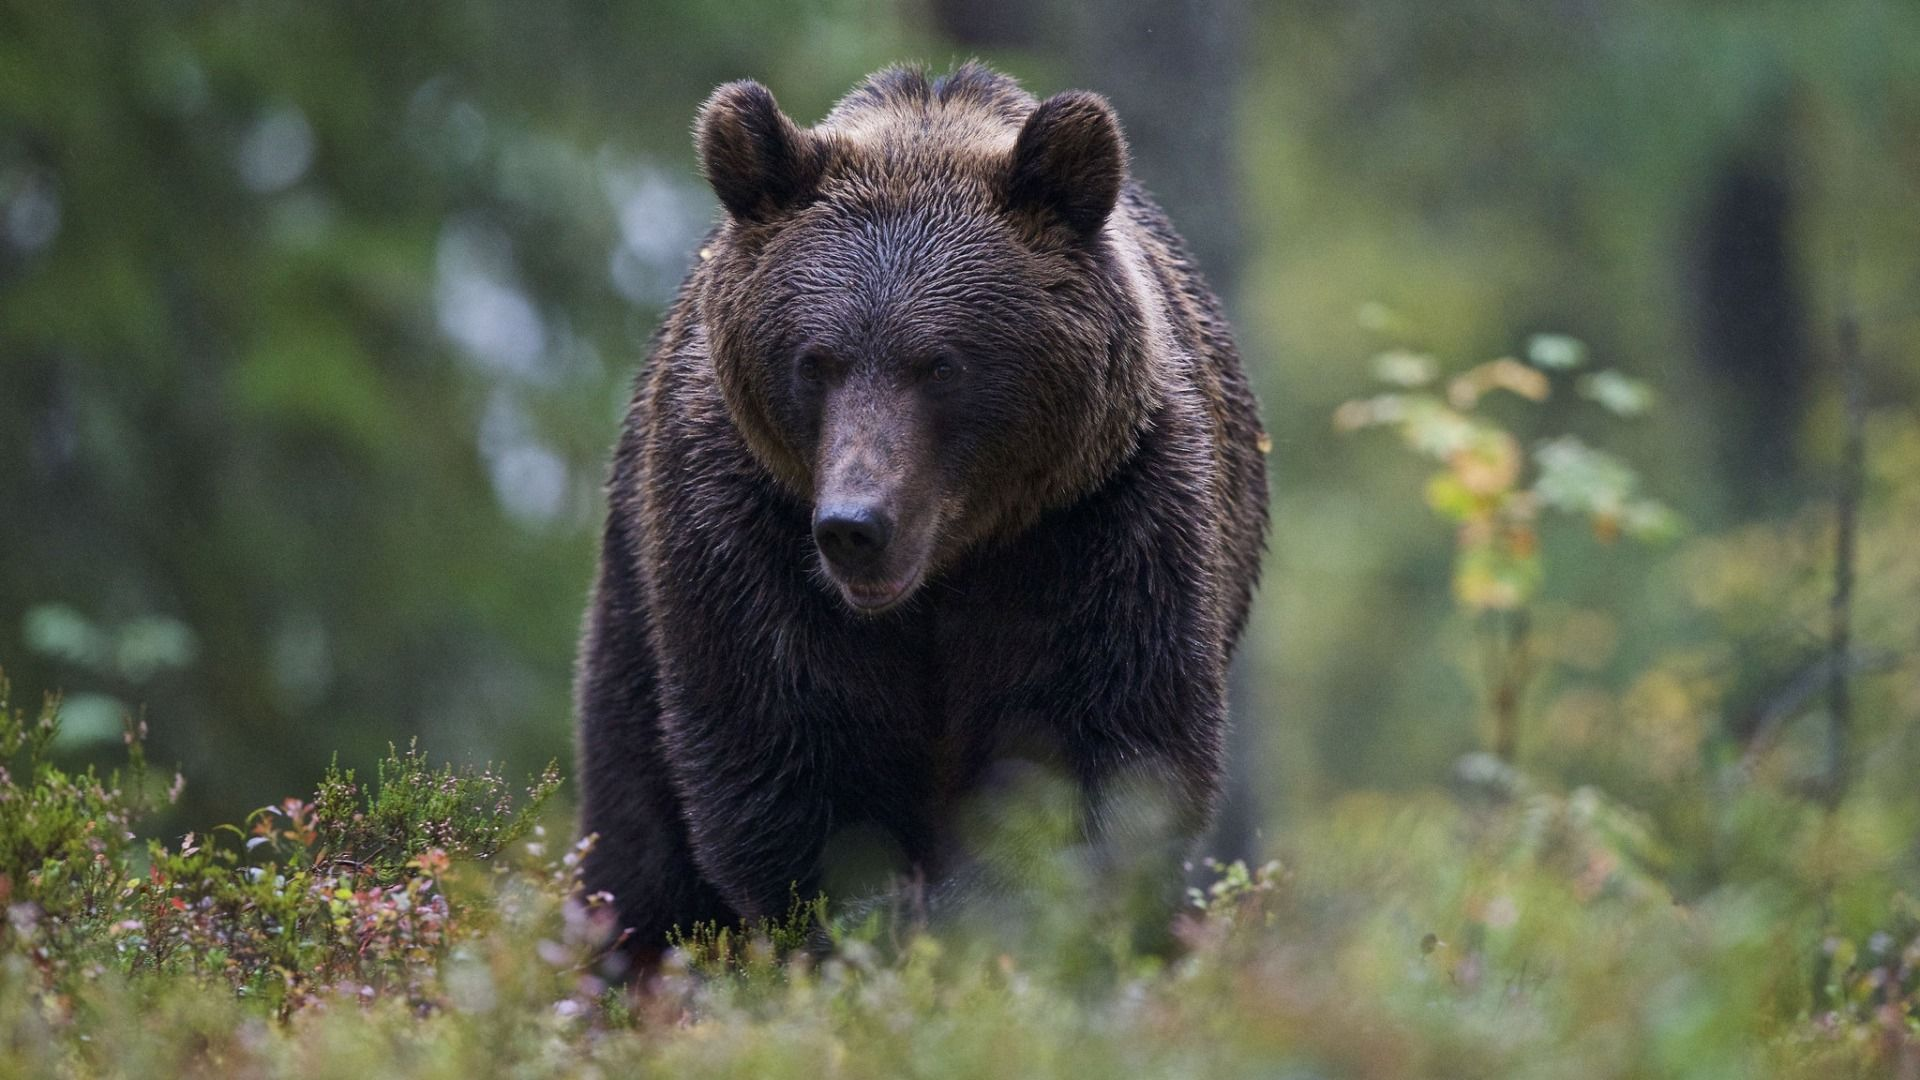 Wallpapers Bokeh, Bear, Forest